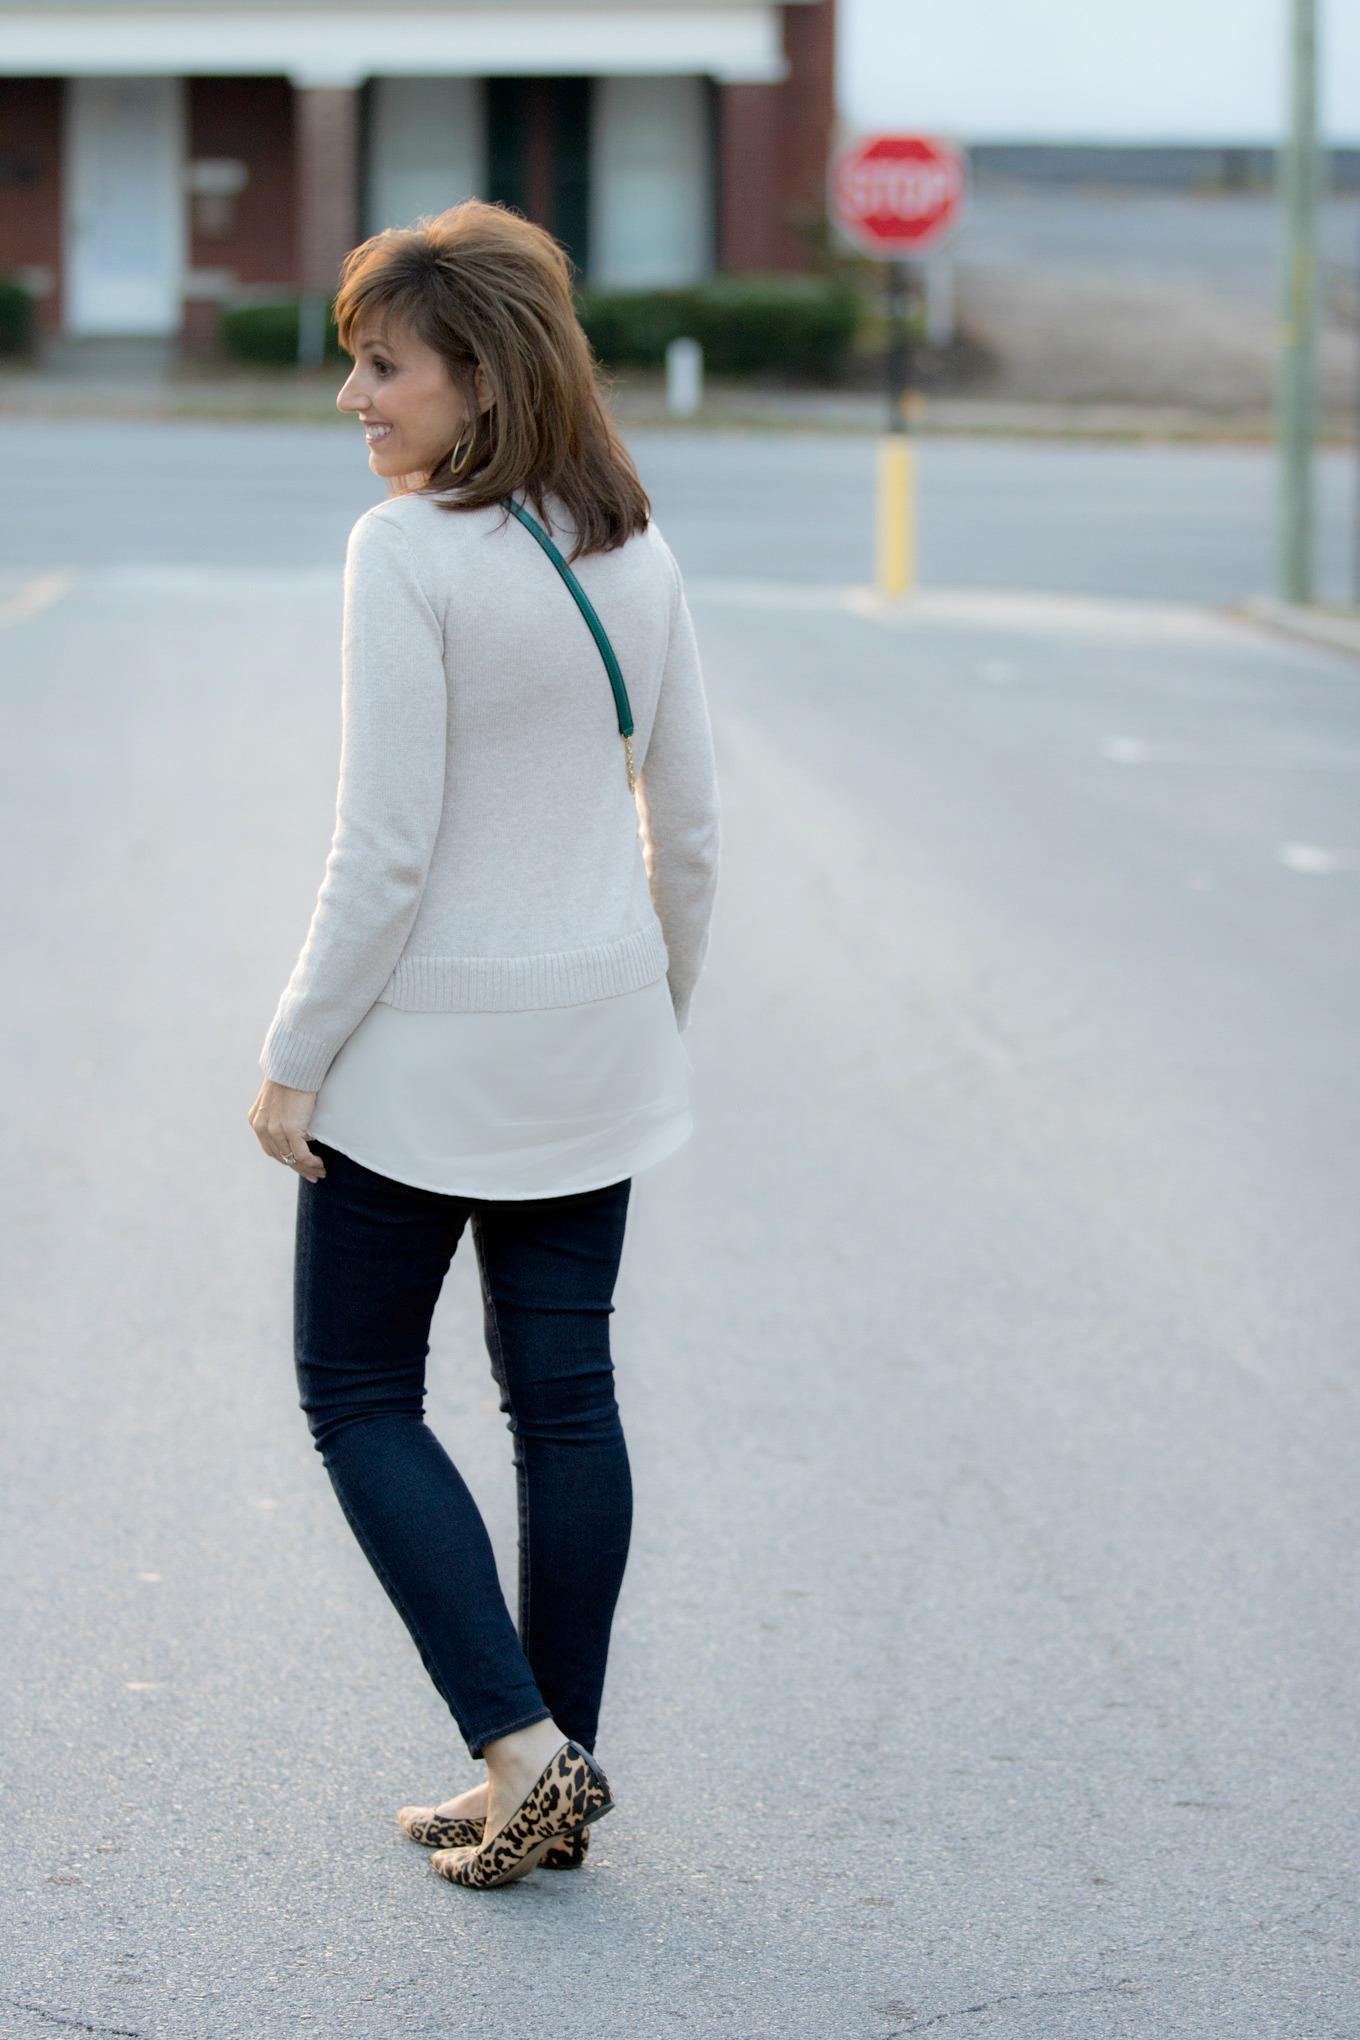 Fashion blogger, Cyndi Spivey, styling a Vera Bradley bag from Macy's.